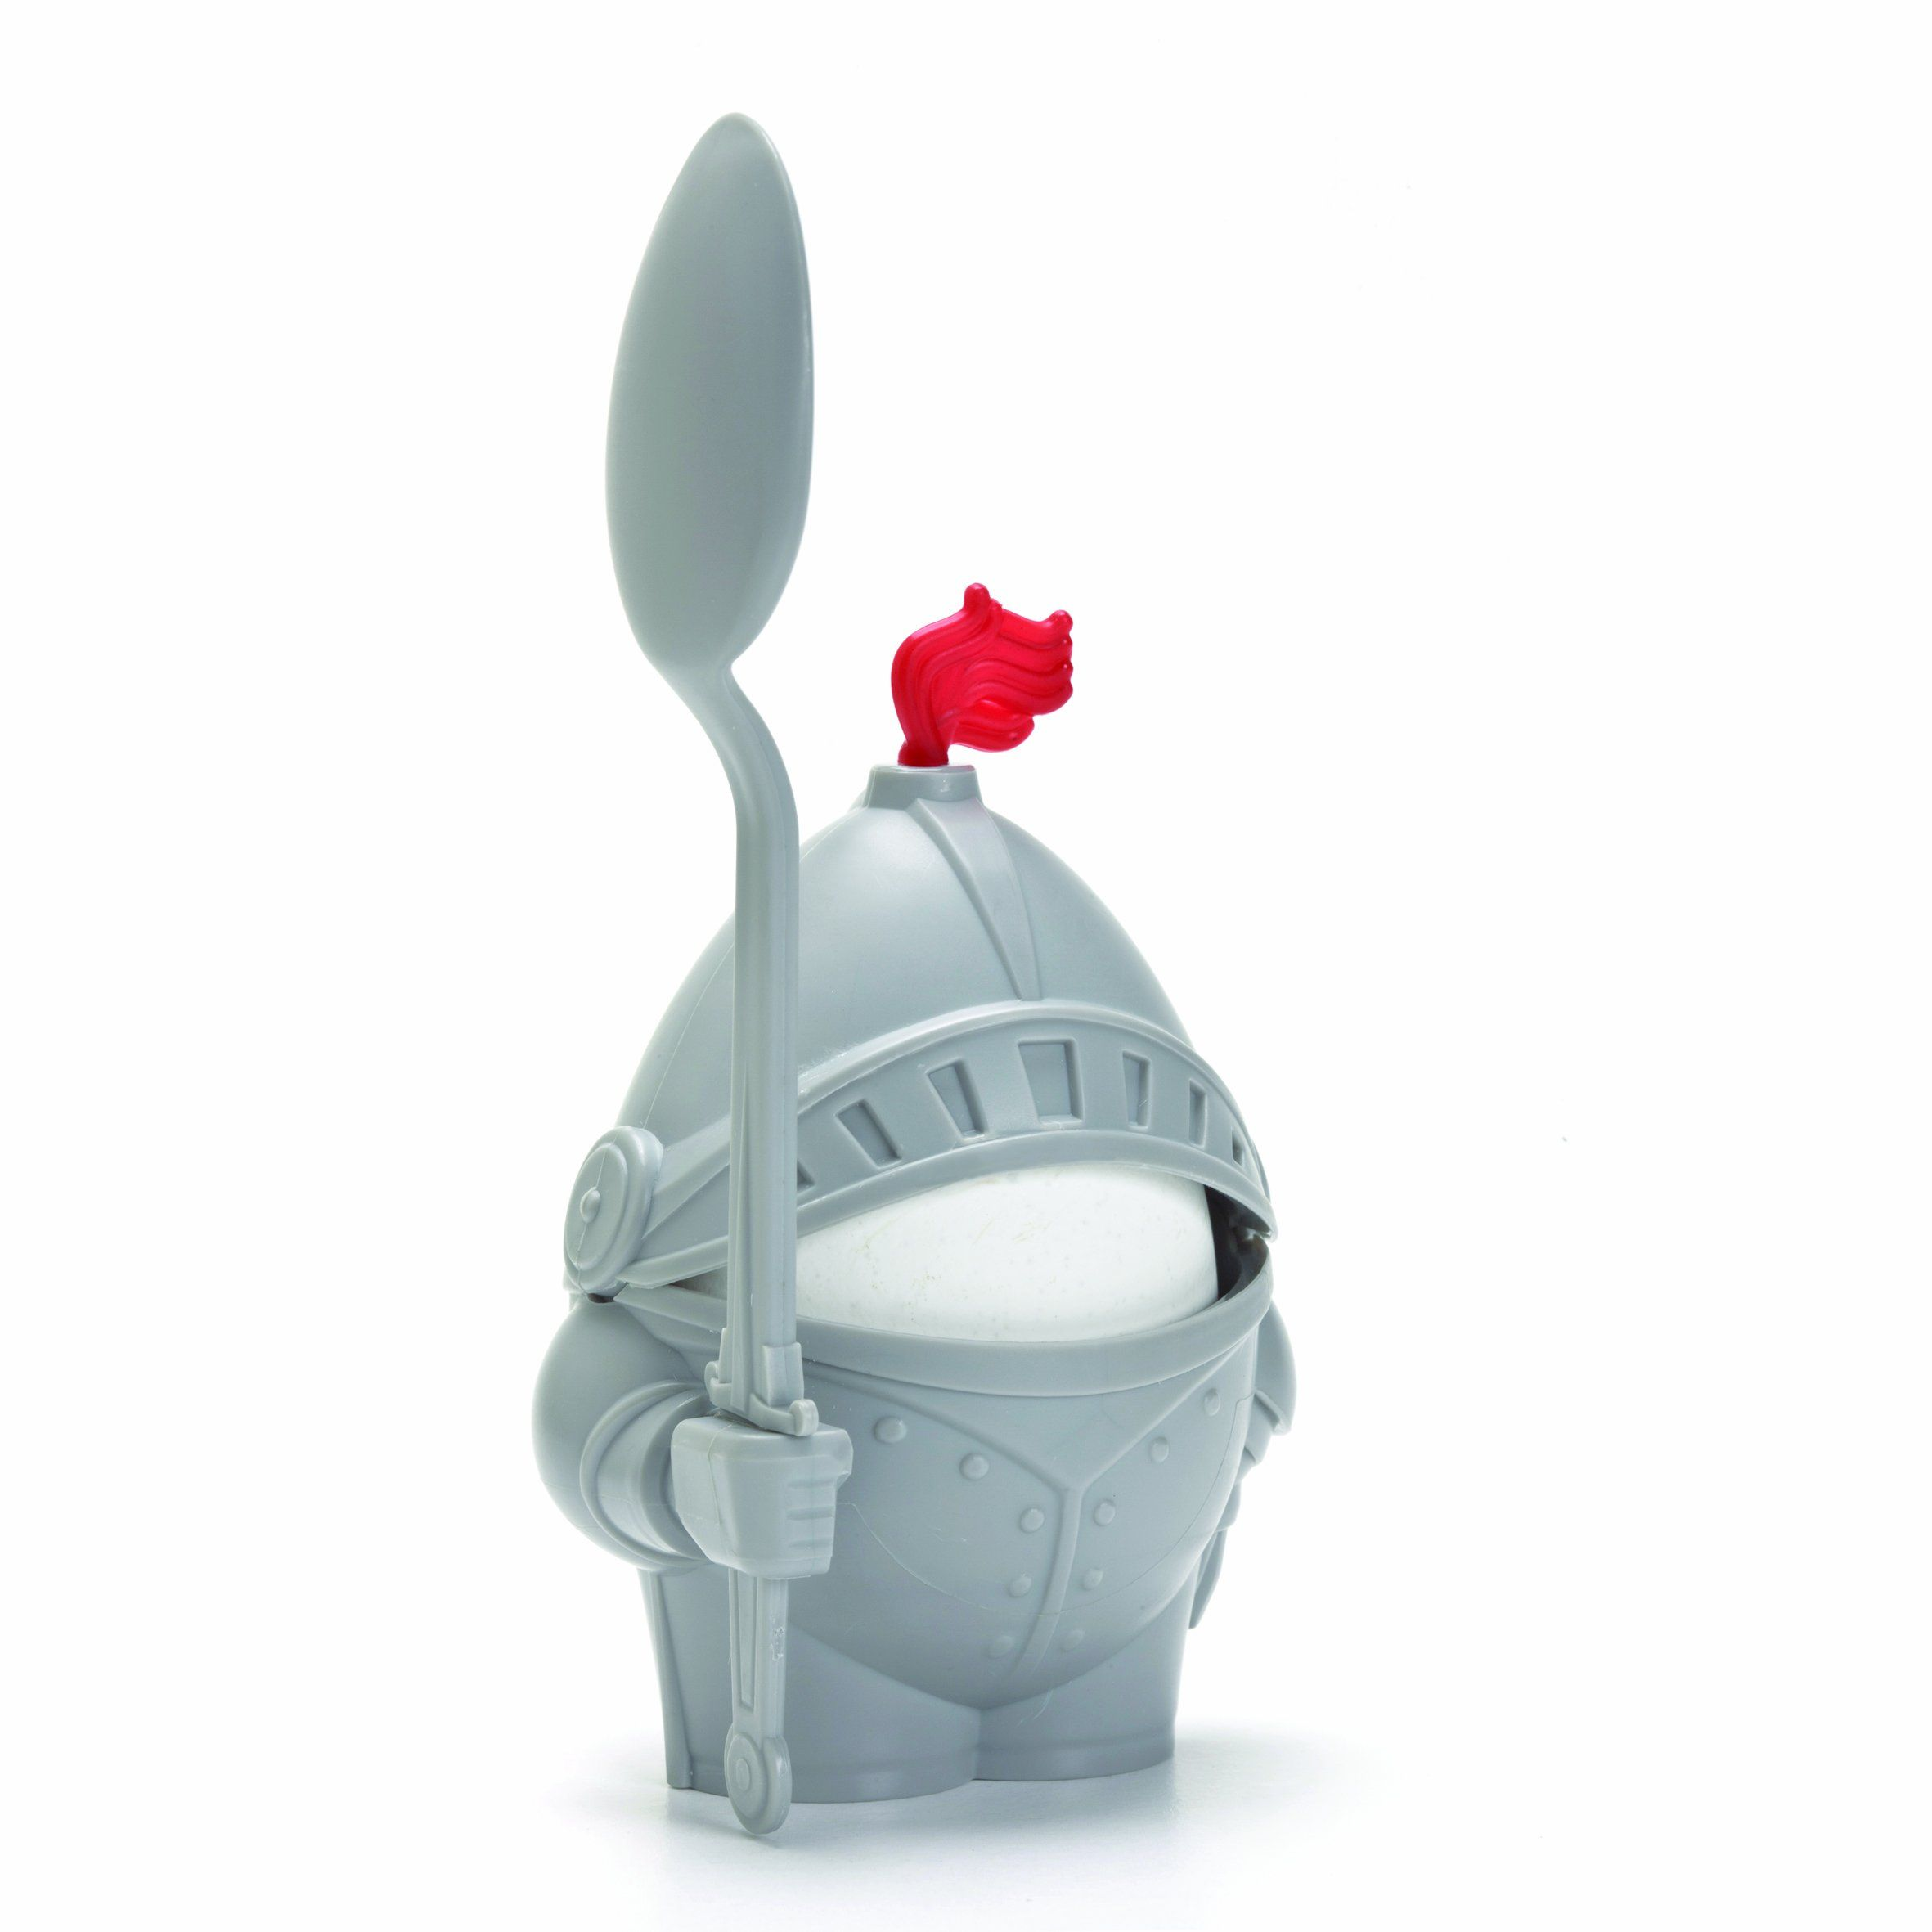 Arthur Boiled Egg Holder with Spoon   Gadgets   Pinterest   Gekochte ...